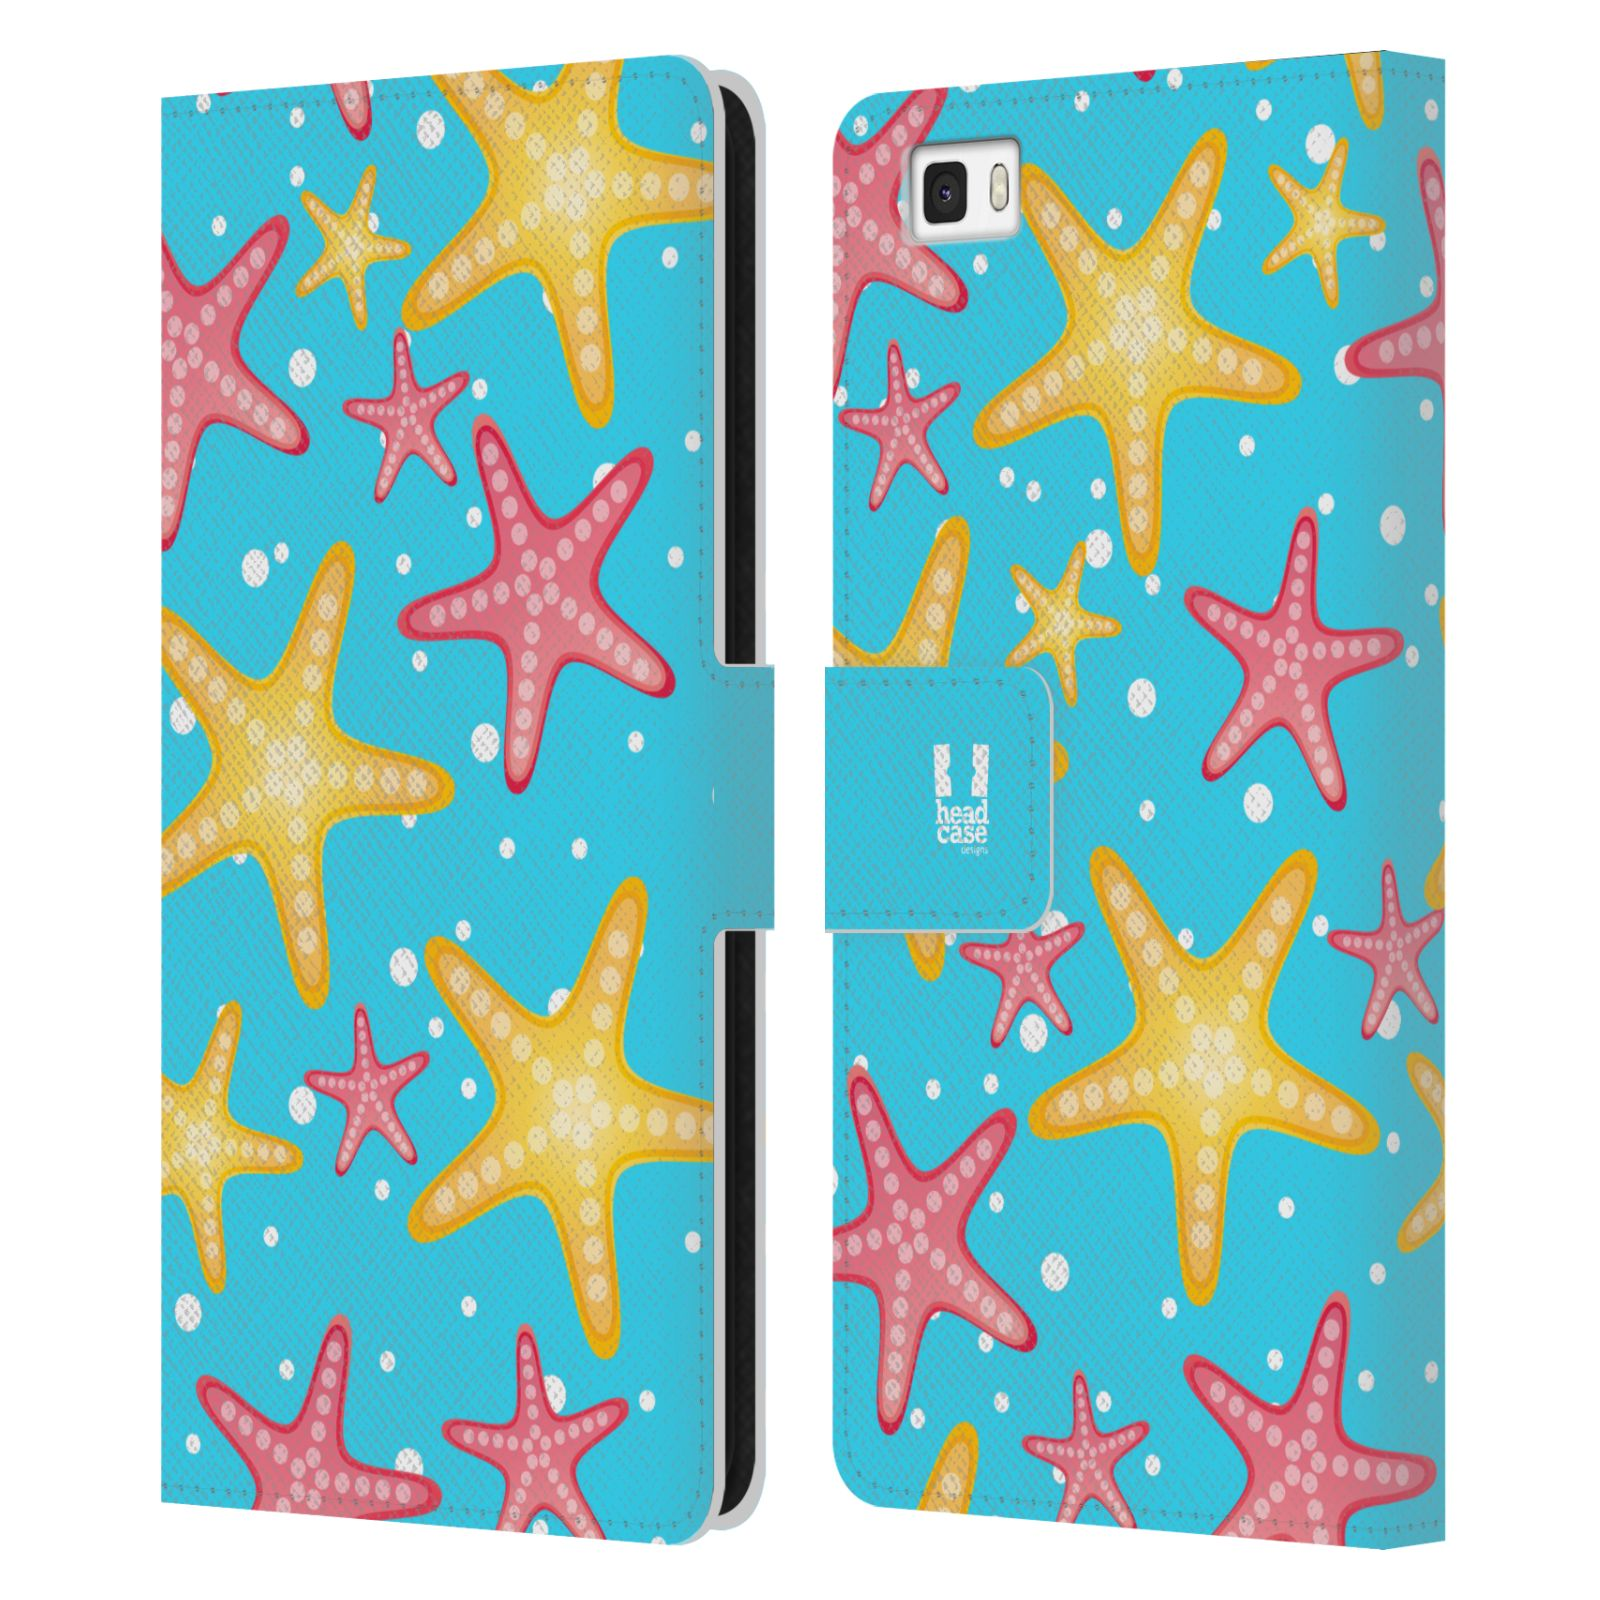 HEAD CASE Flipové pouzdro pro mobil Huawei P8 LITE Mořský živočich hvězdice modrá barva pozadí